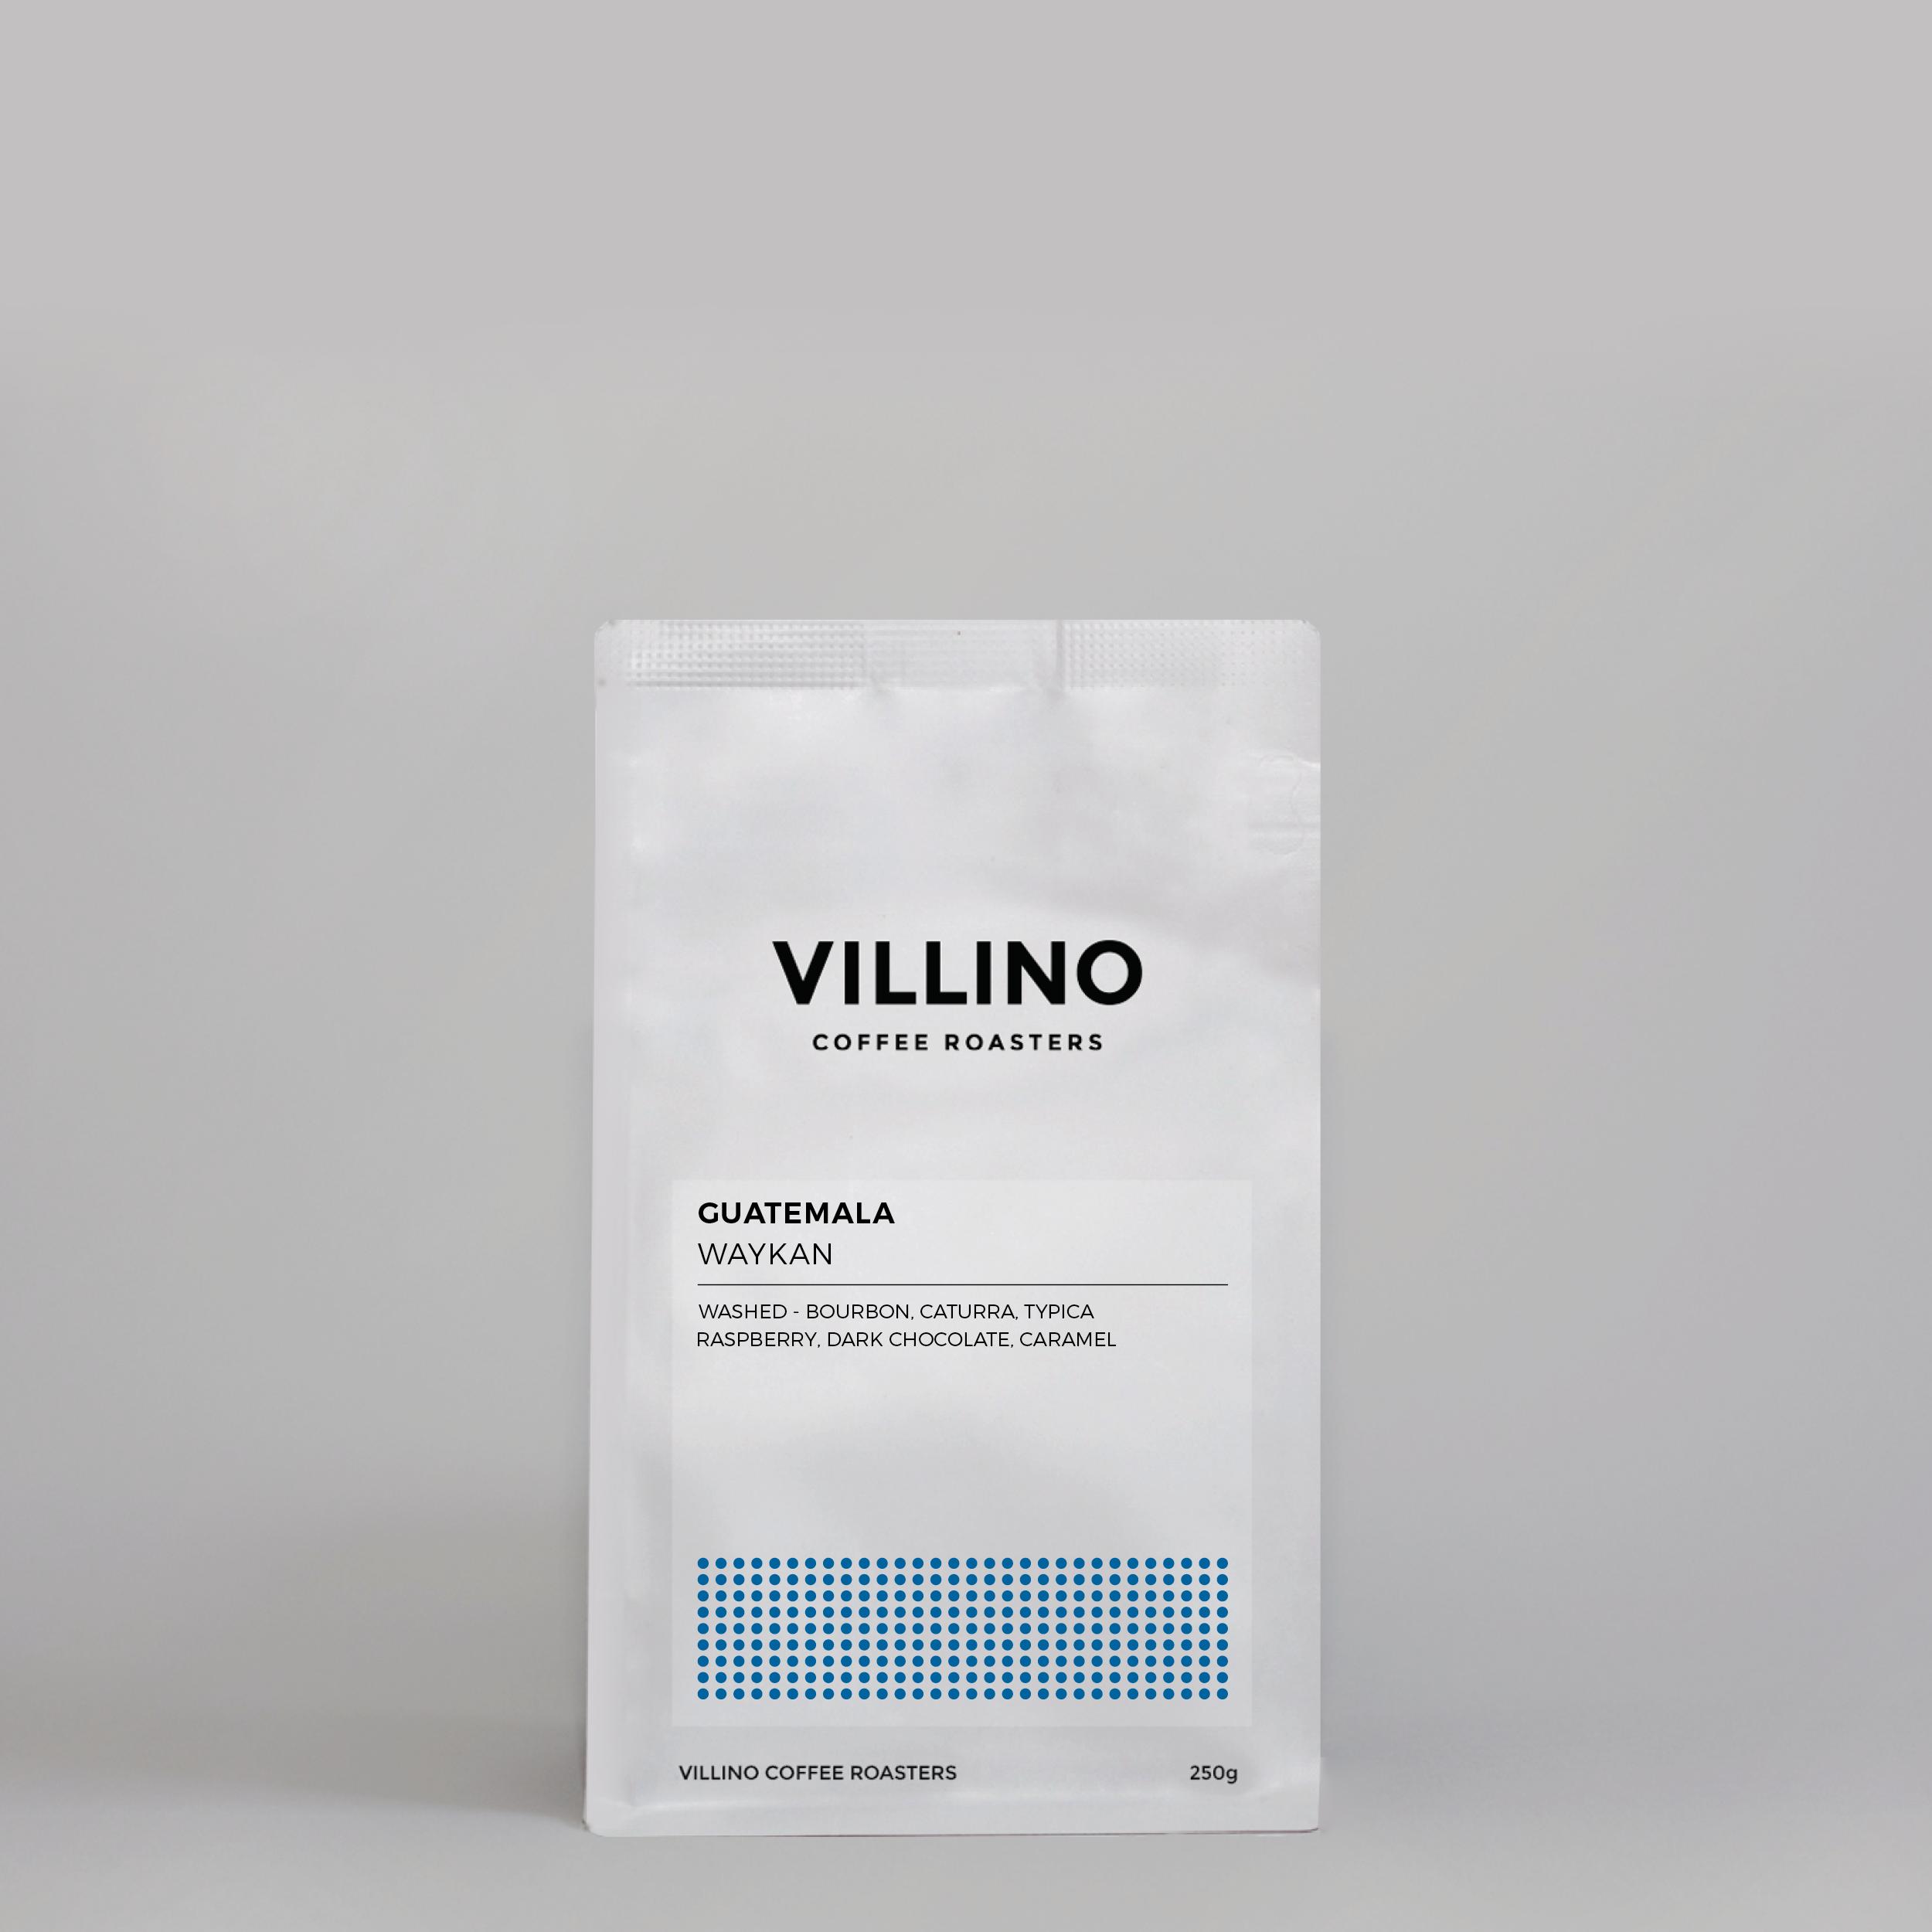 Villino_Retail Bag Guatemala Waykan_600x600px18.png